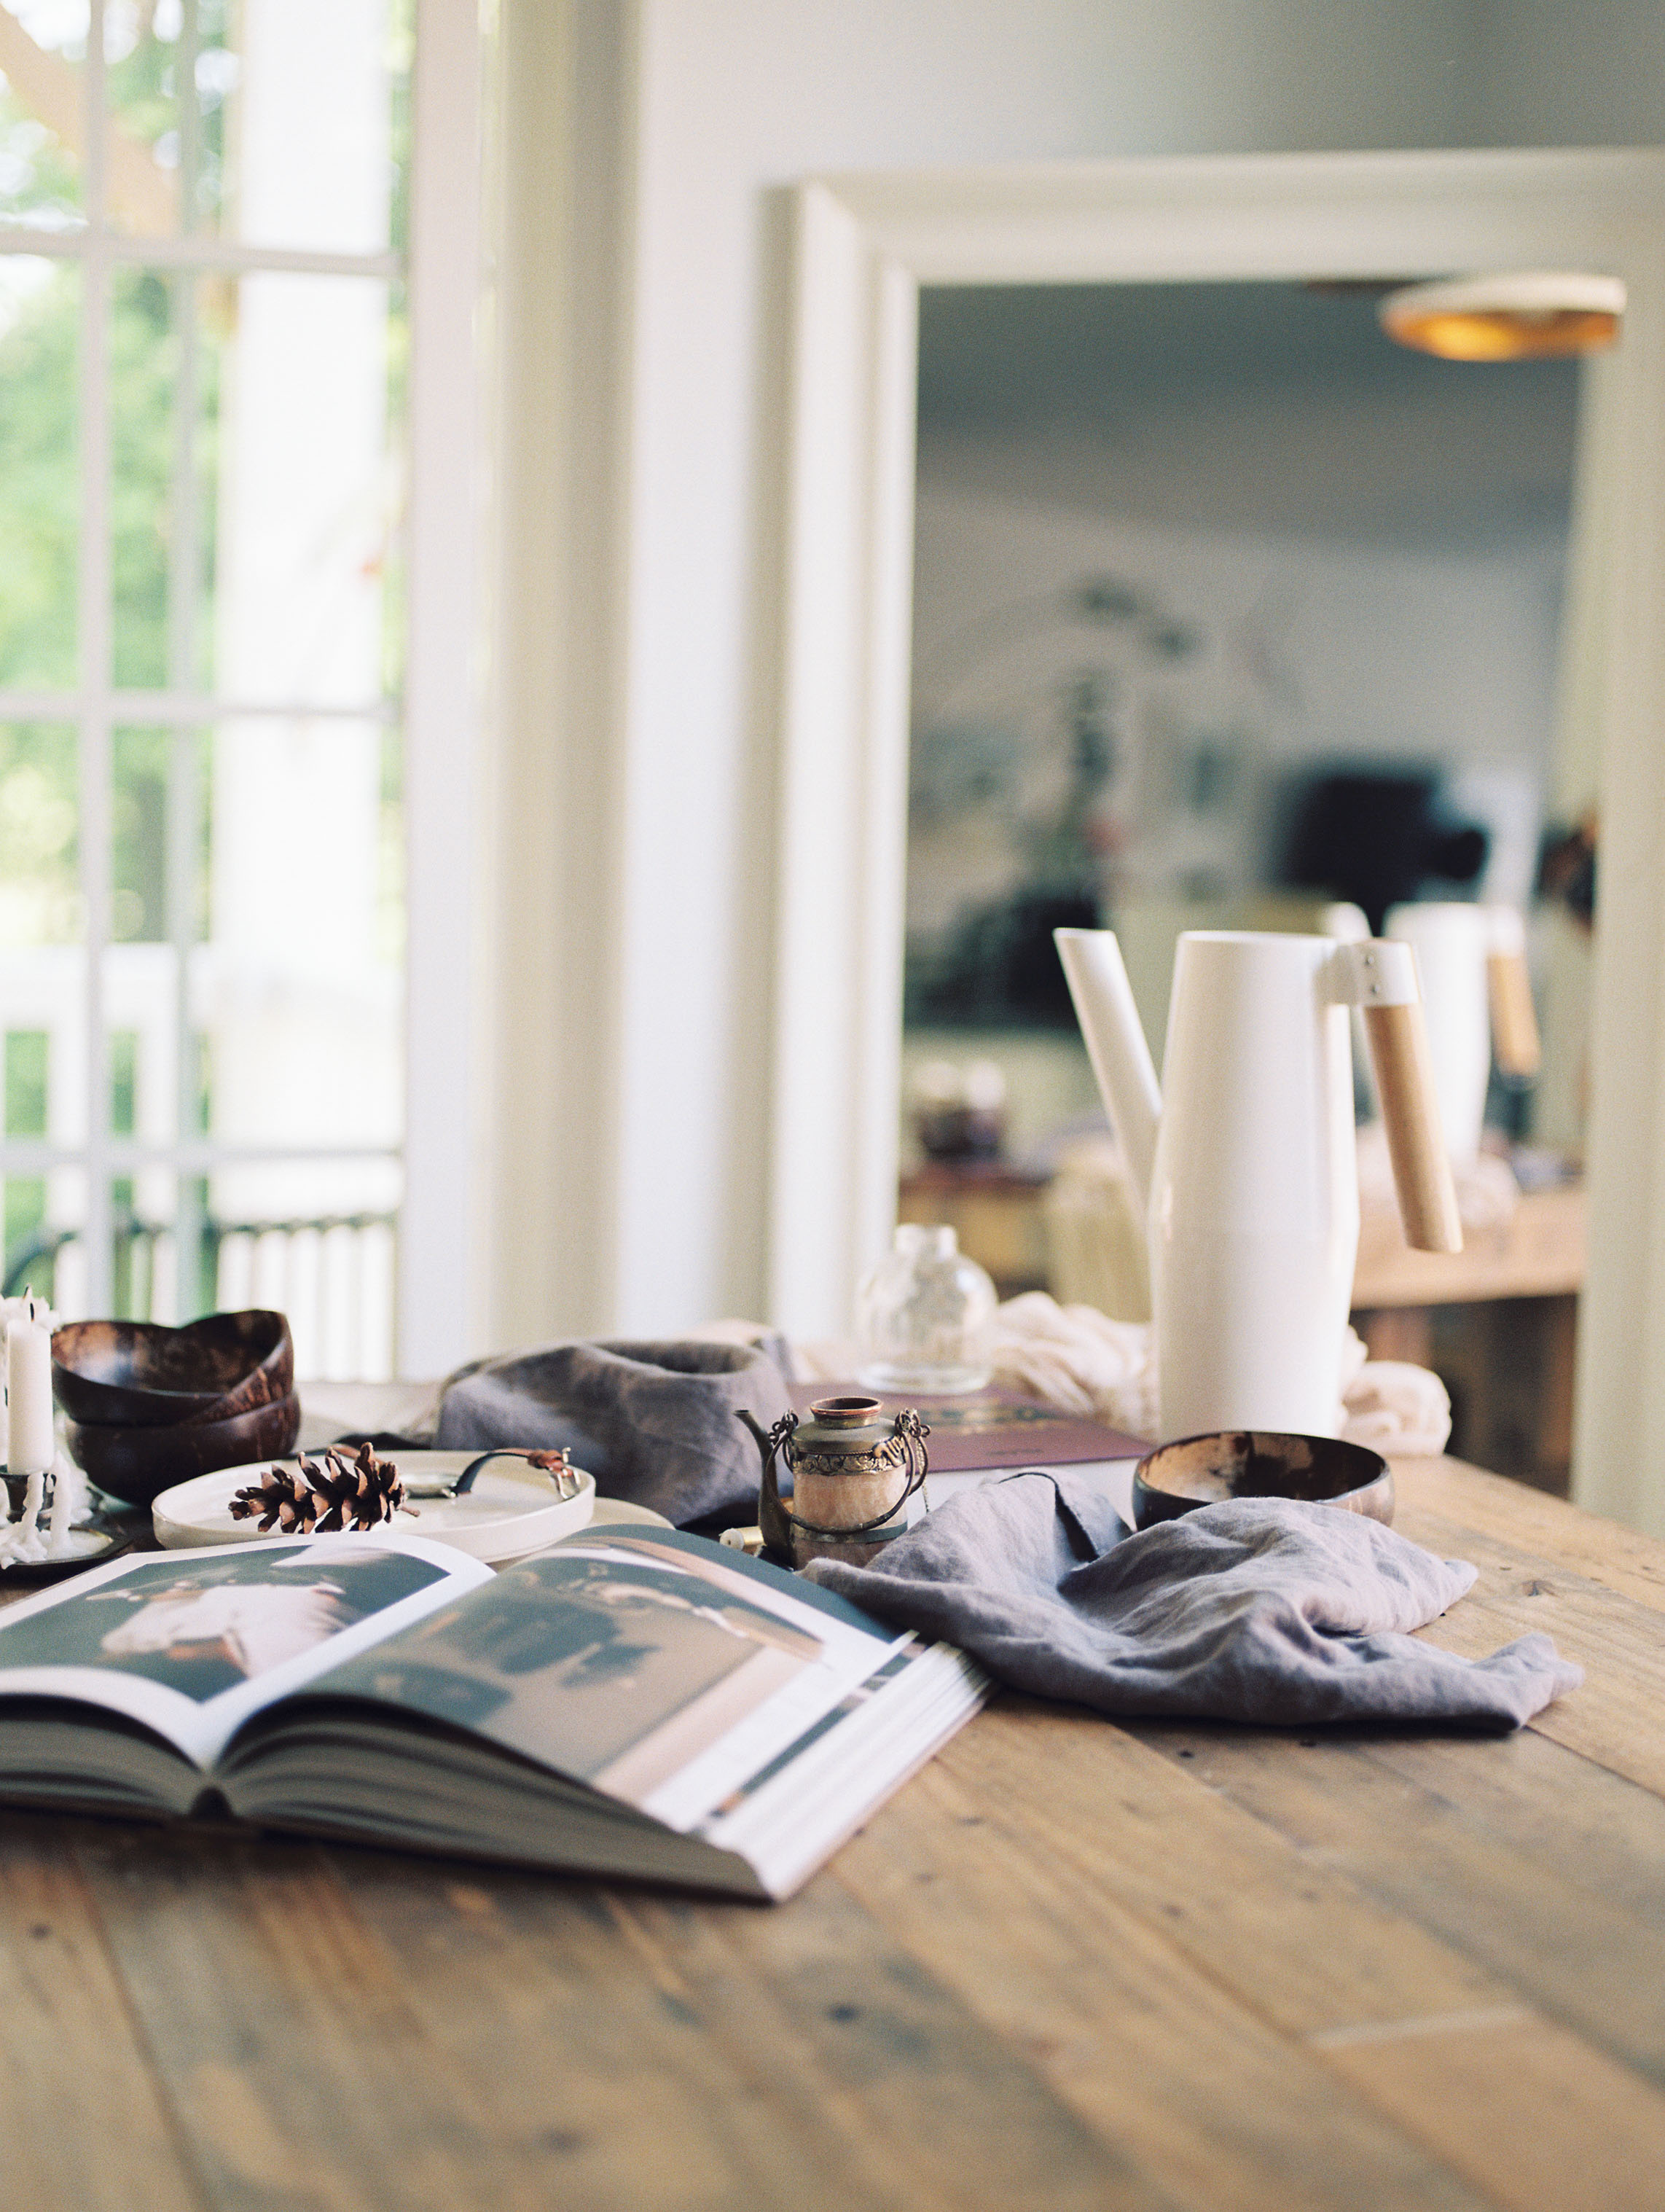 lifestyle editorial, cottage hill mag, creative career, fine art photography, fine art lifestyle photography, du soleil photographie, philadelphia fine art photographer